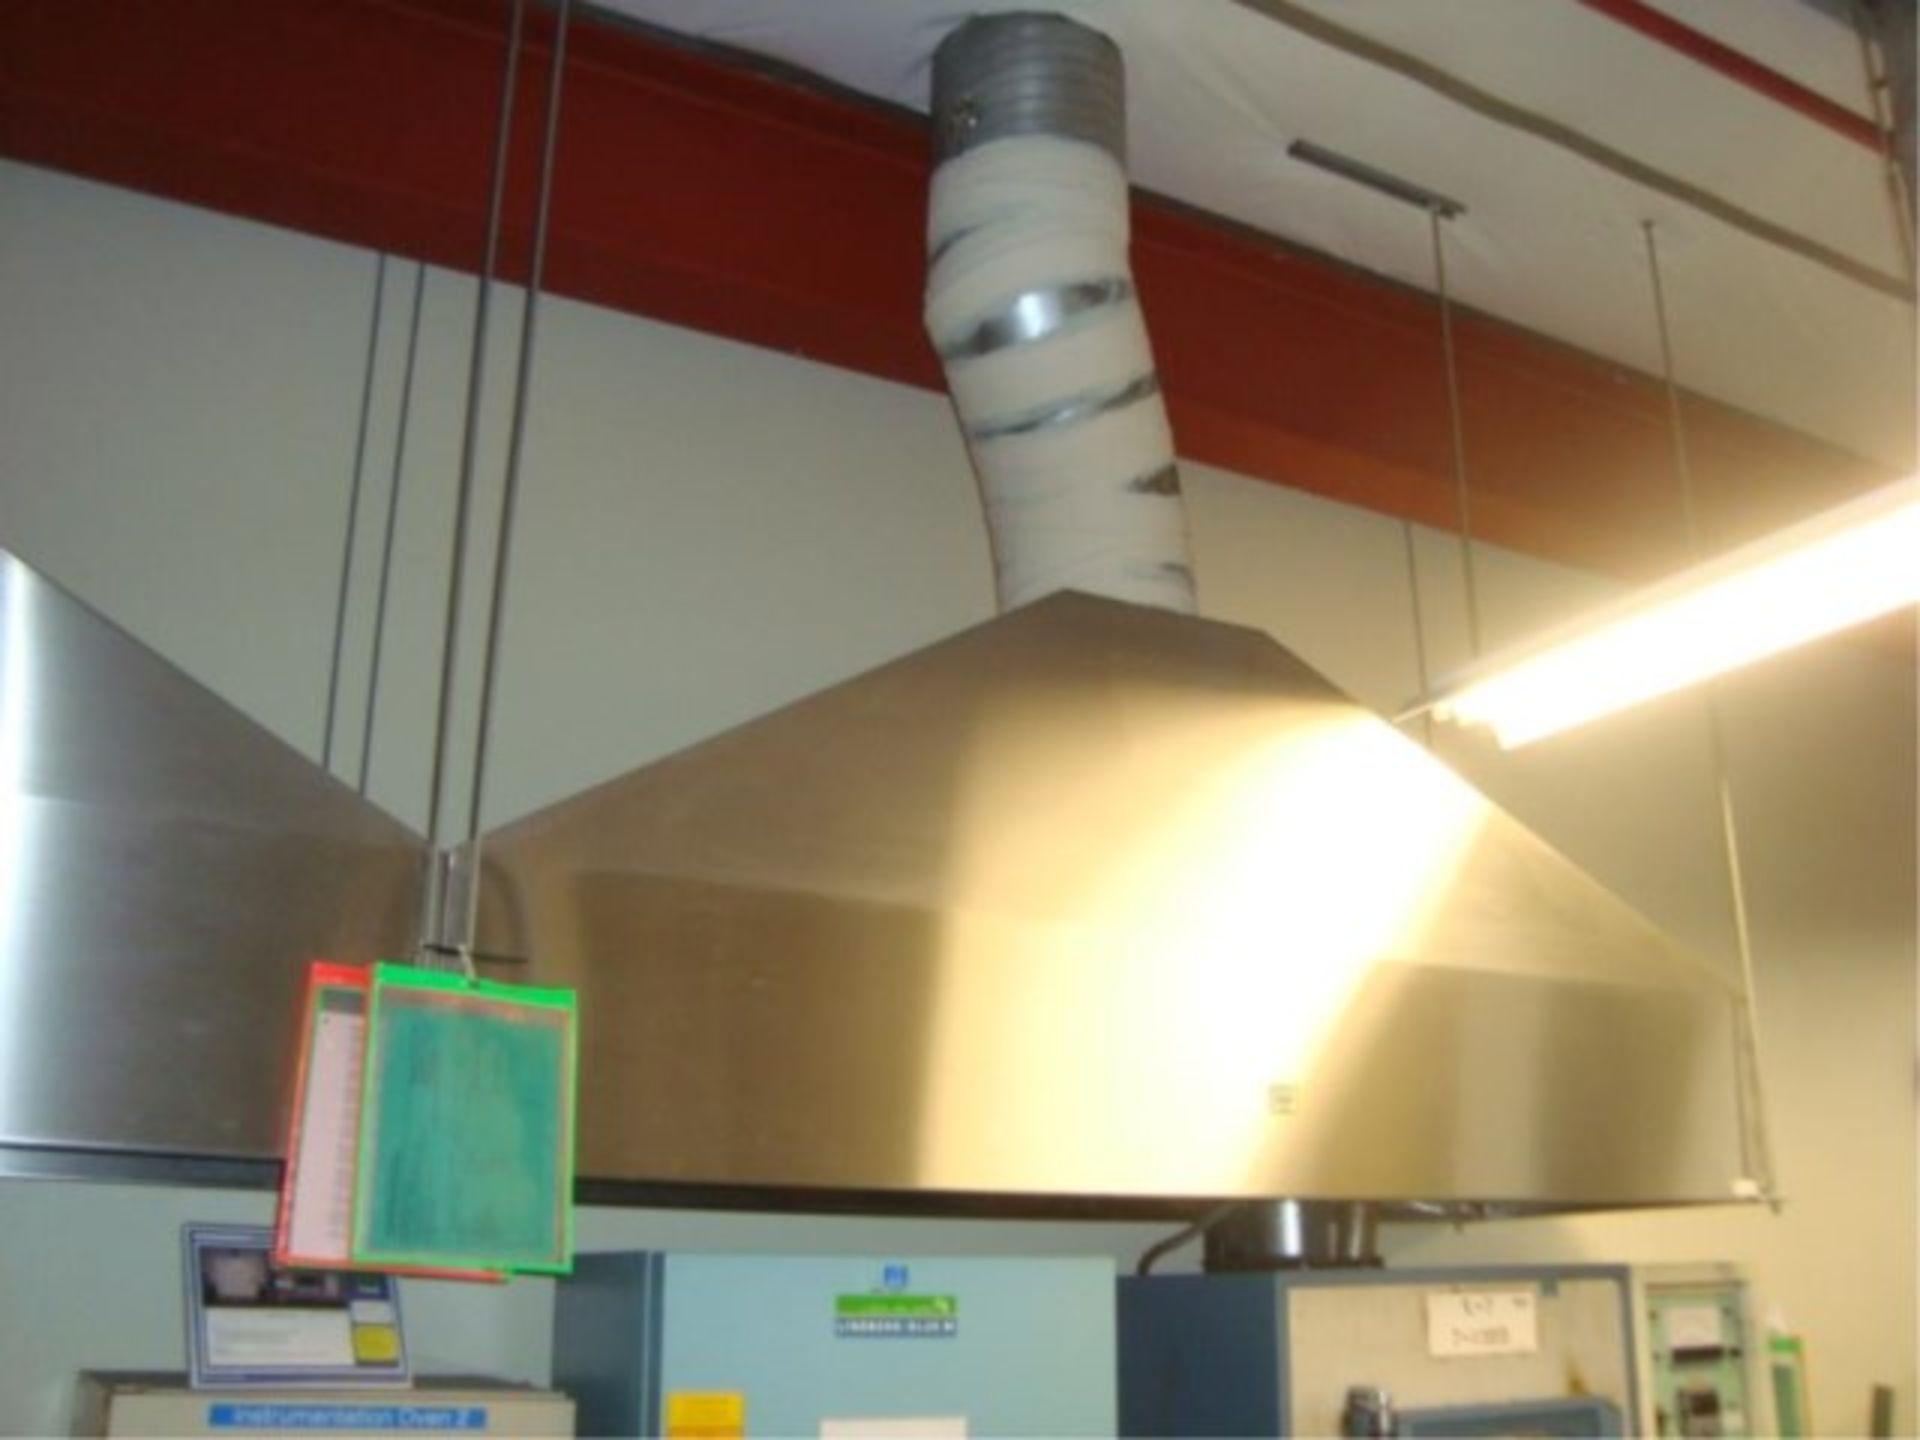 Lot 105 - Stainless Steel Exhaust Hoods